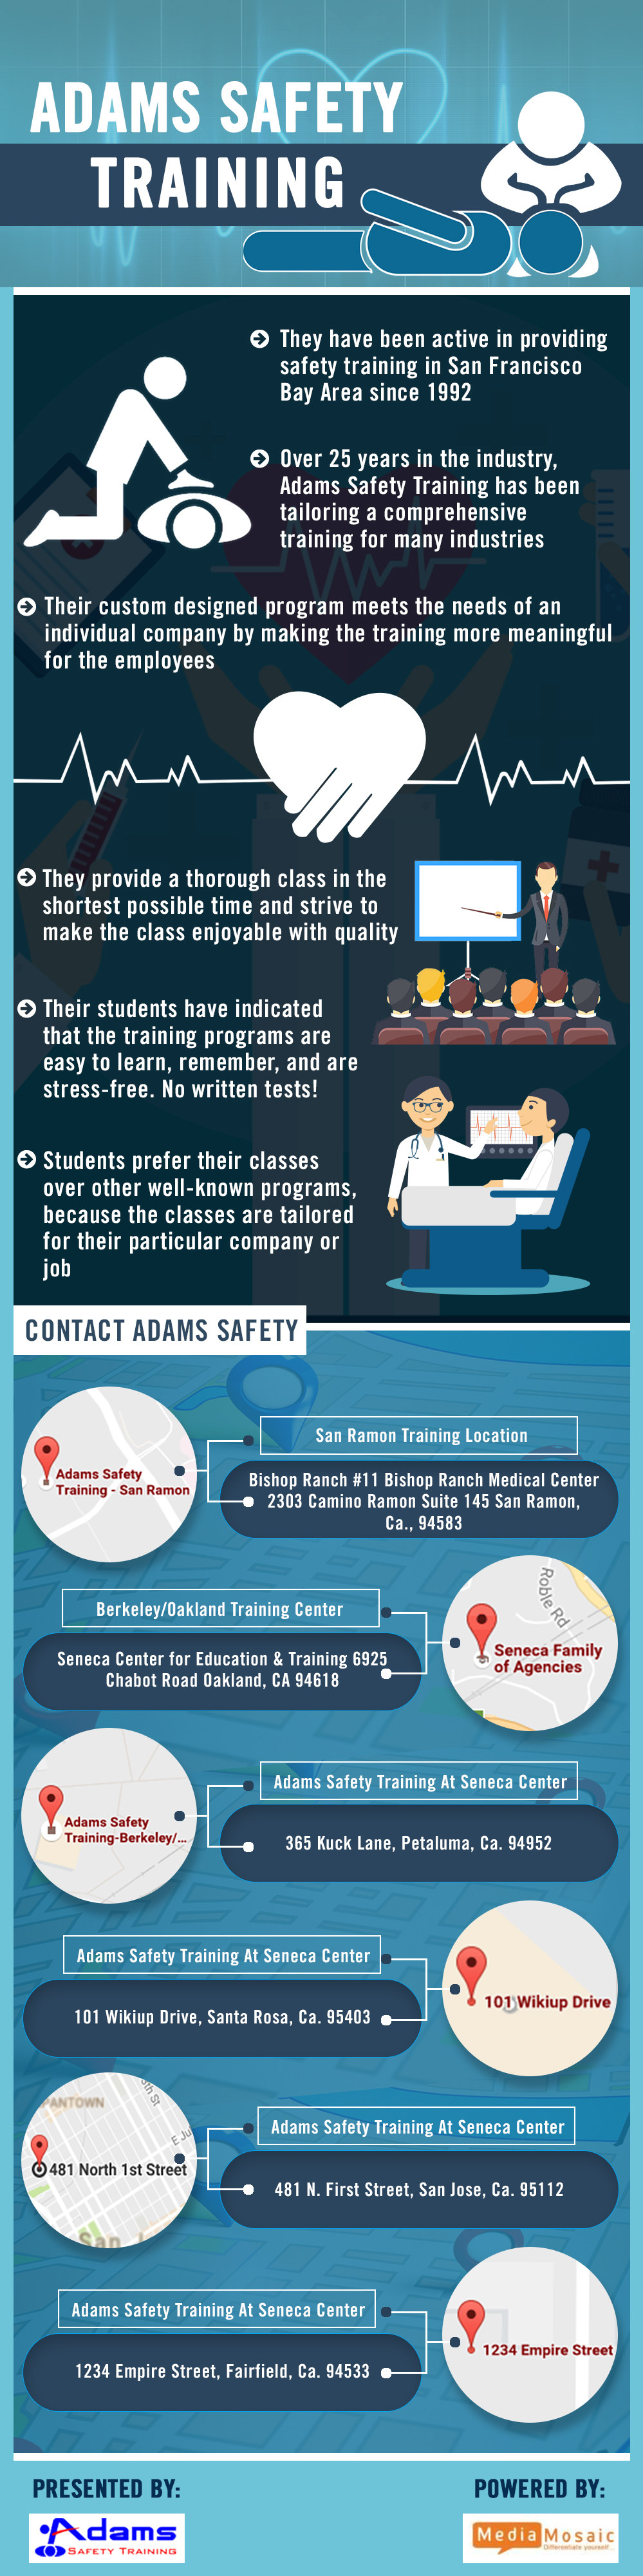 Adams Safety Training